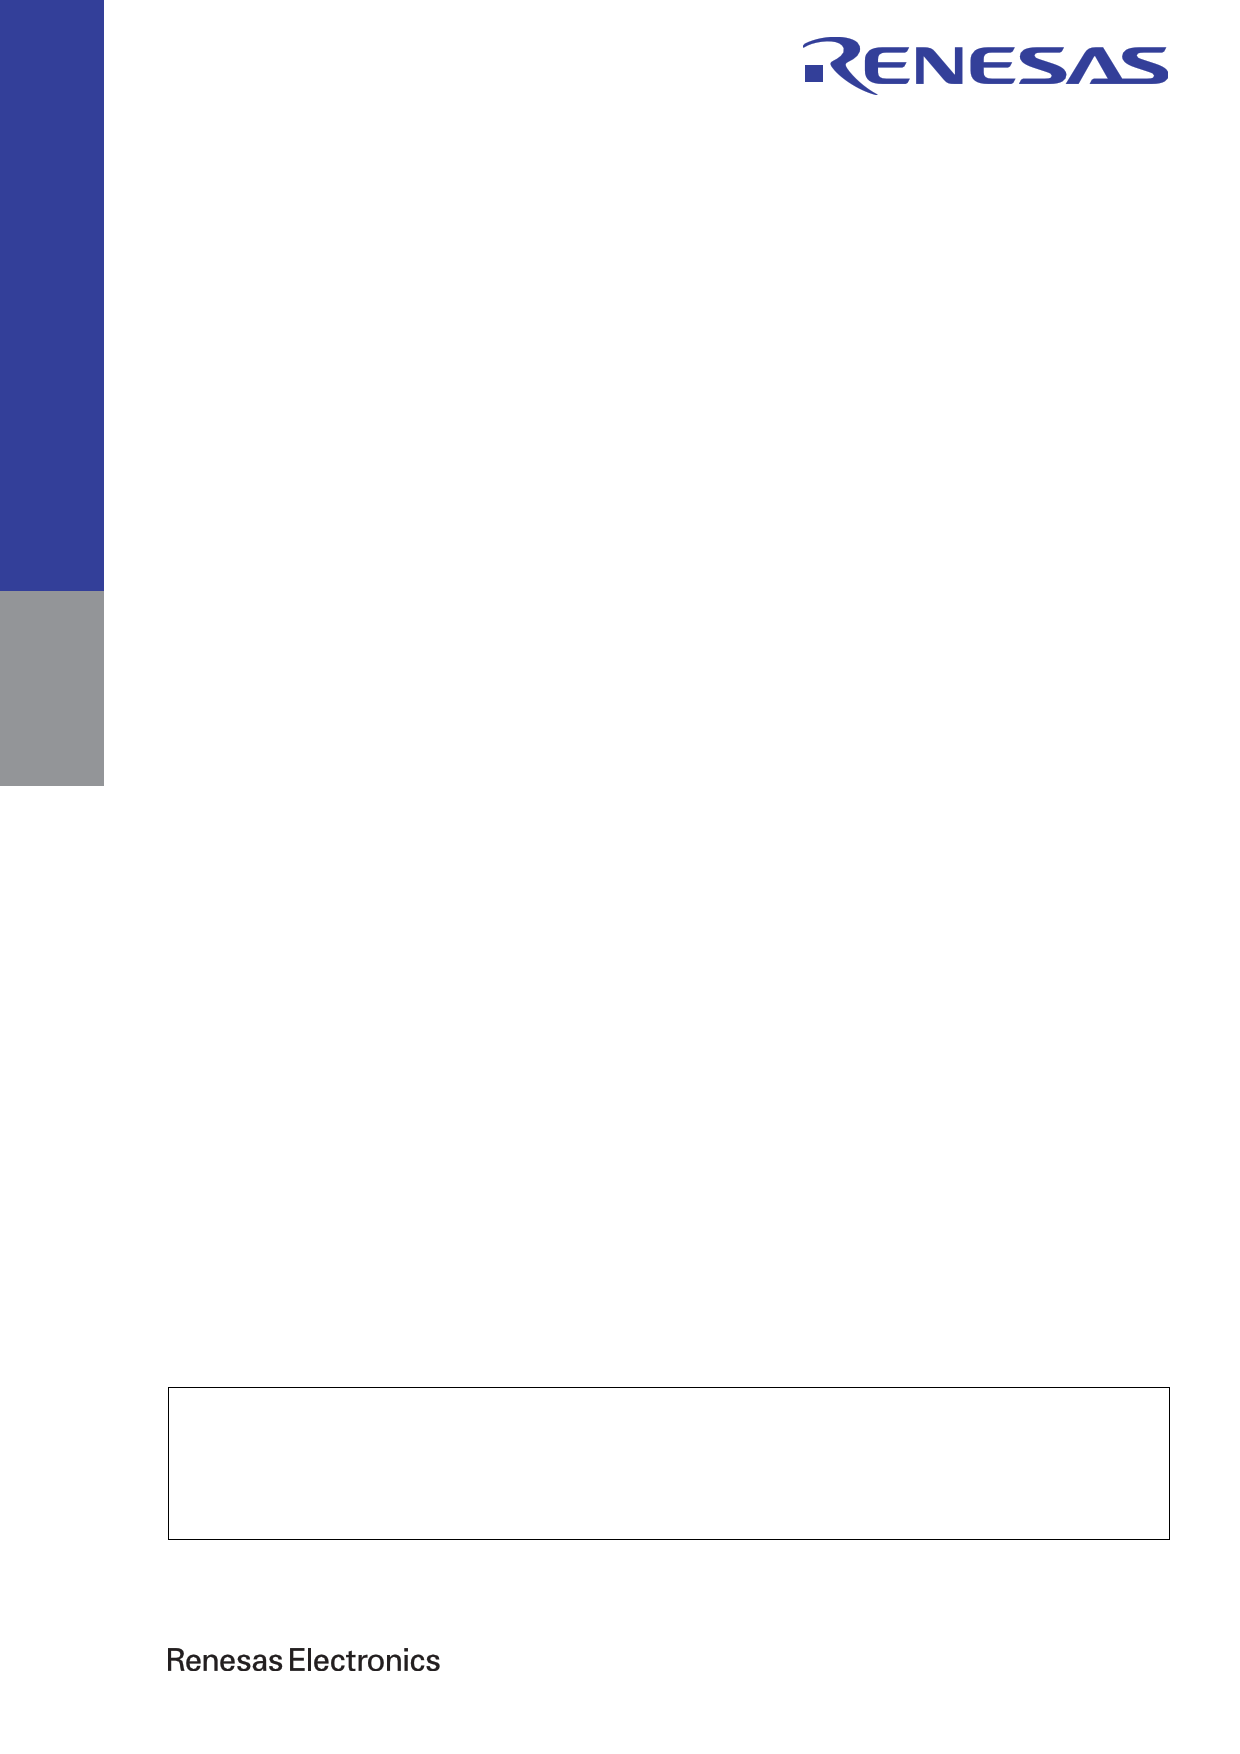 Rh850 datasheet